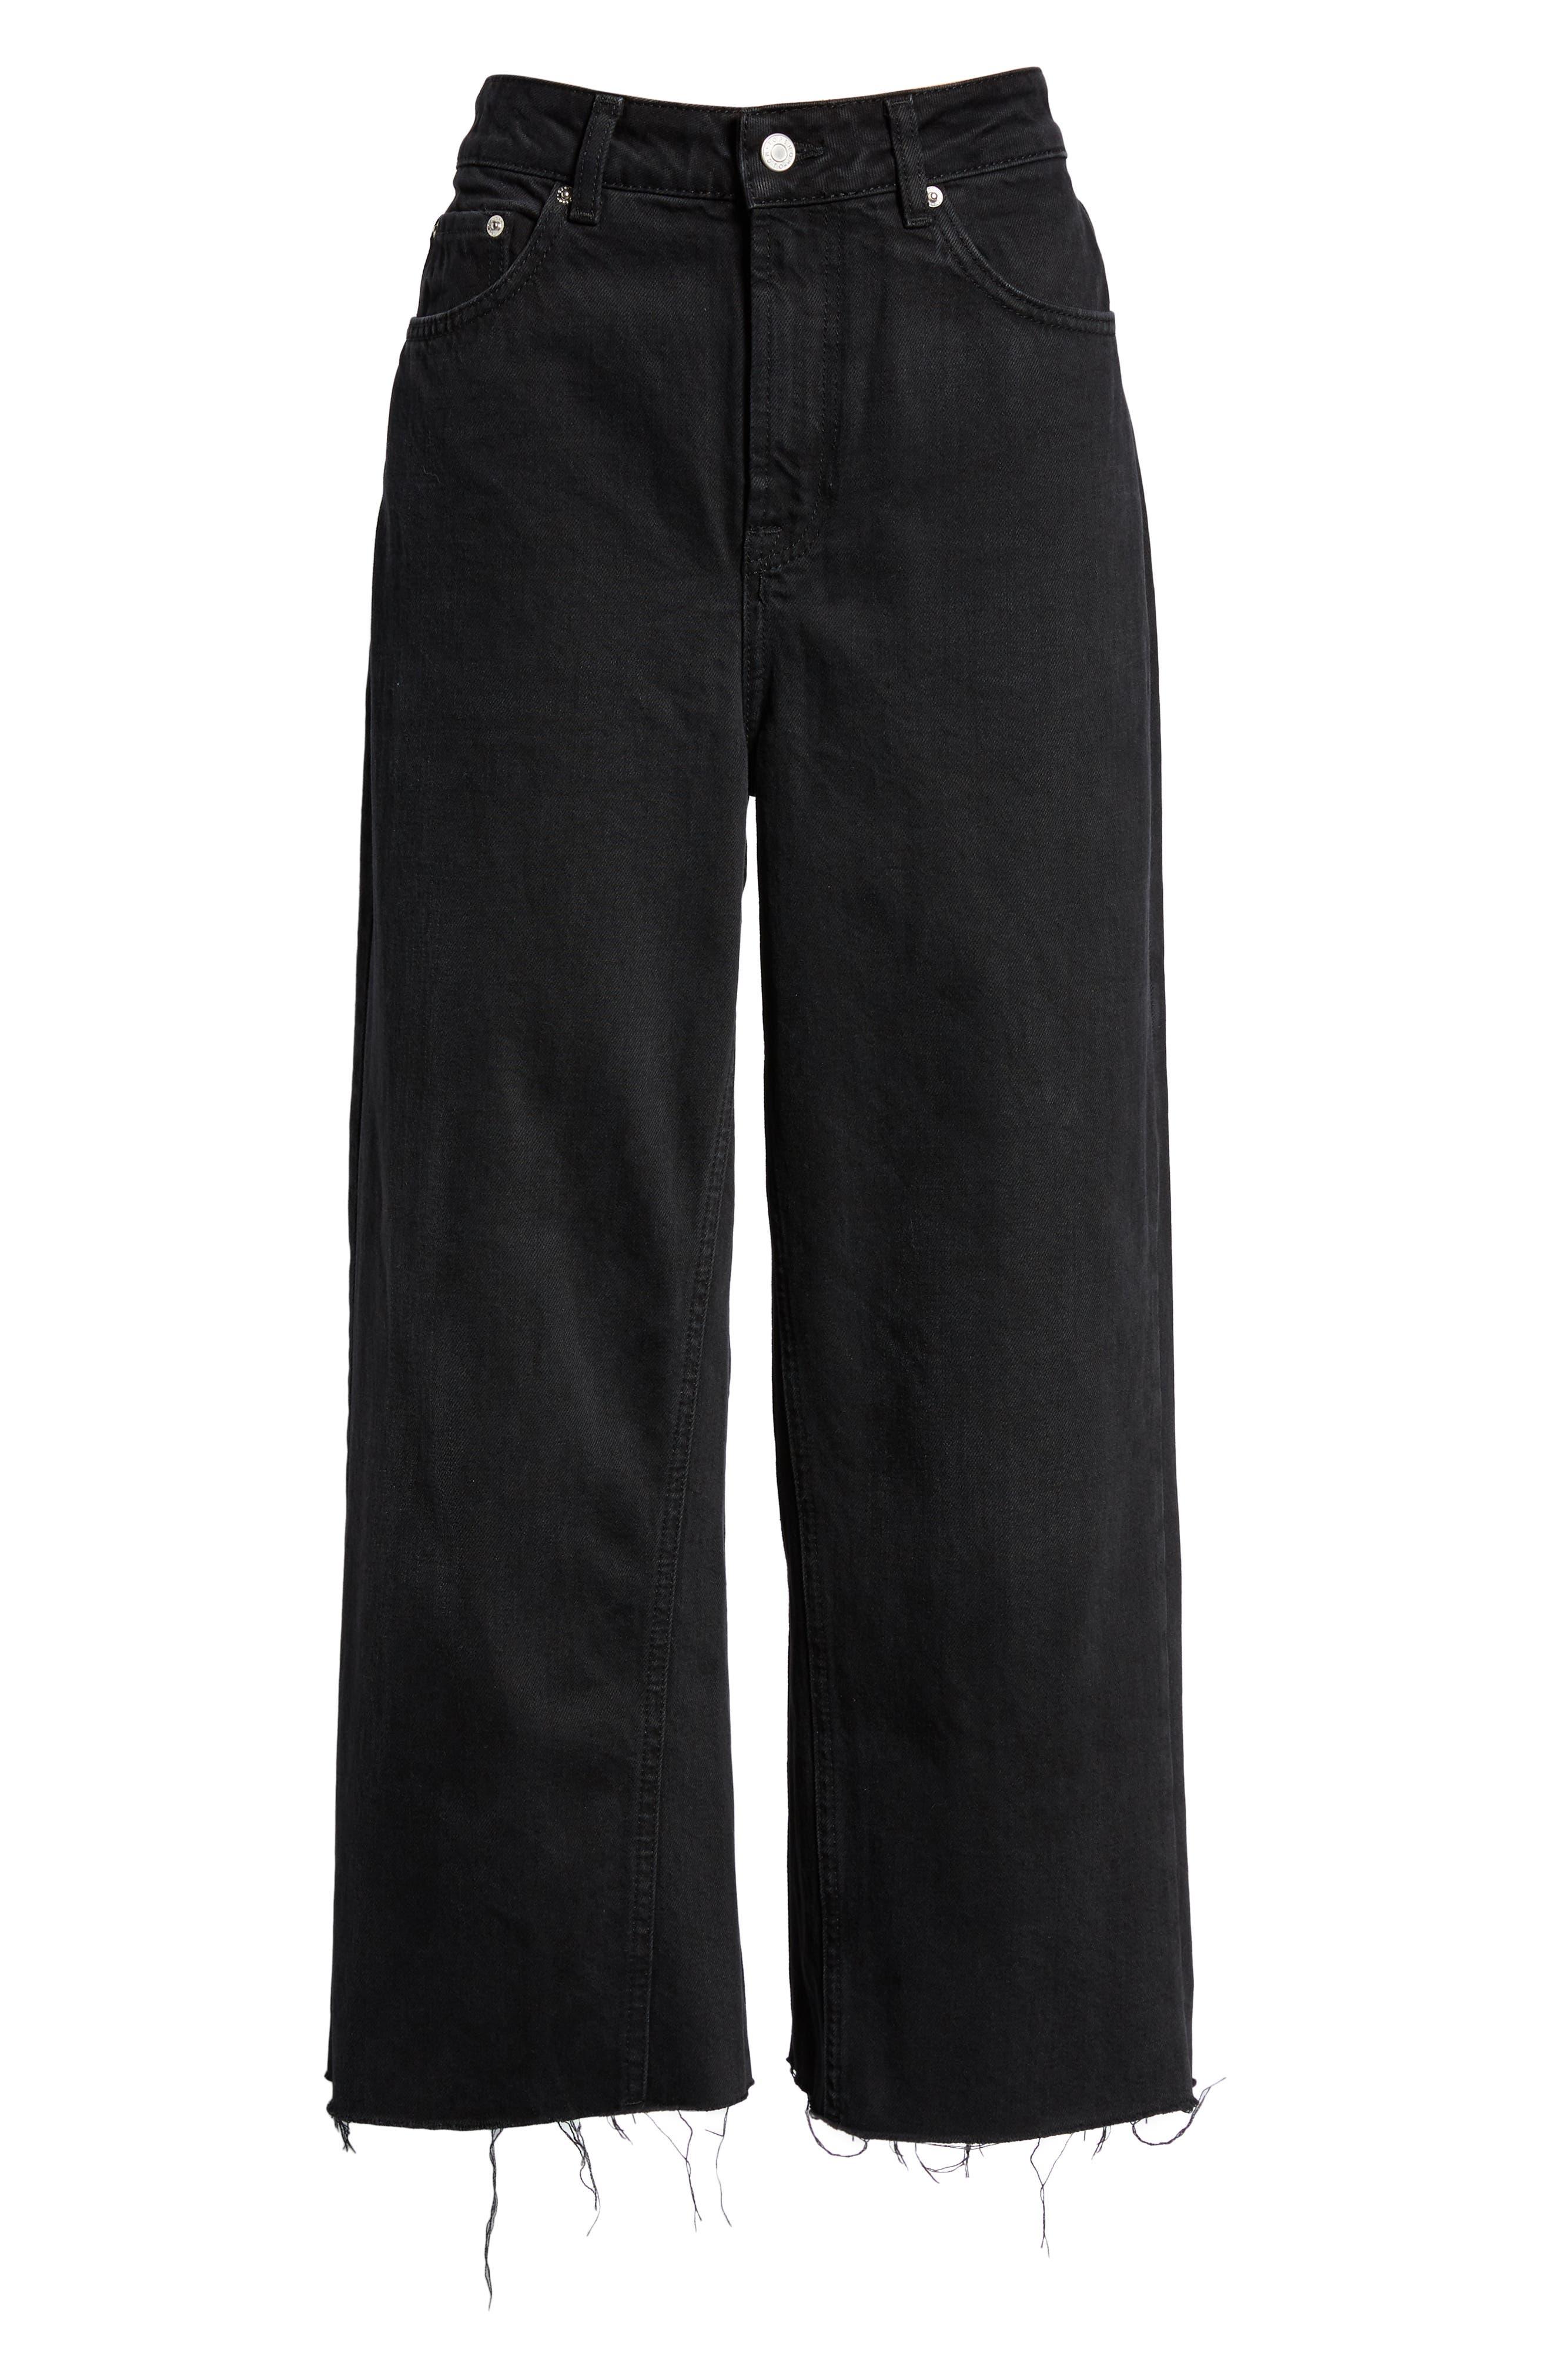 TOPSHOP, Wide Leg Crop Jeans, Alternate thumbnail 7, color, WASHED BLACK